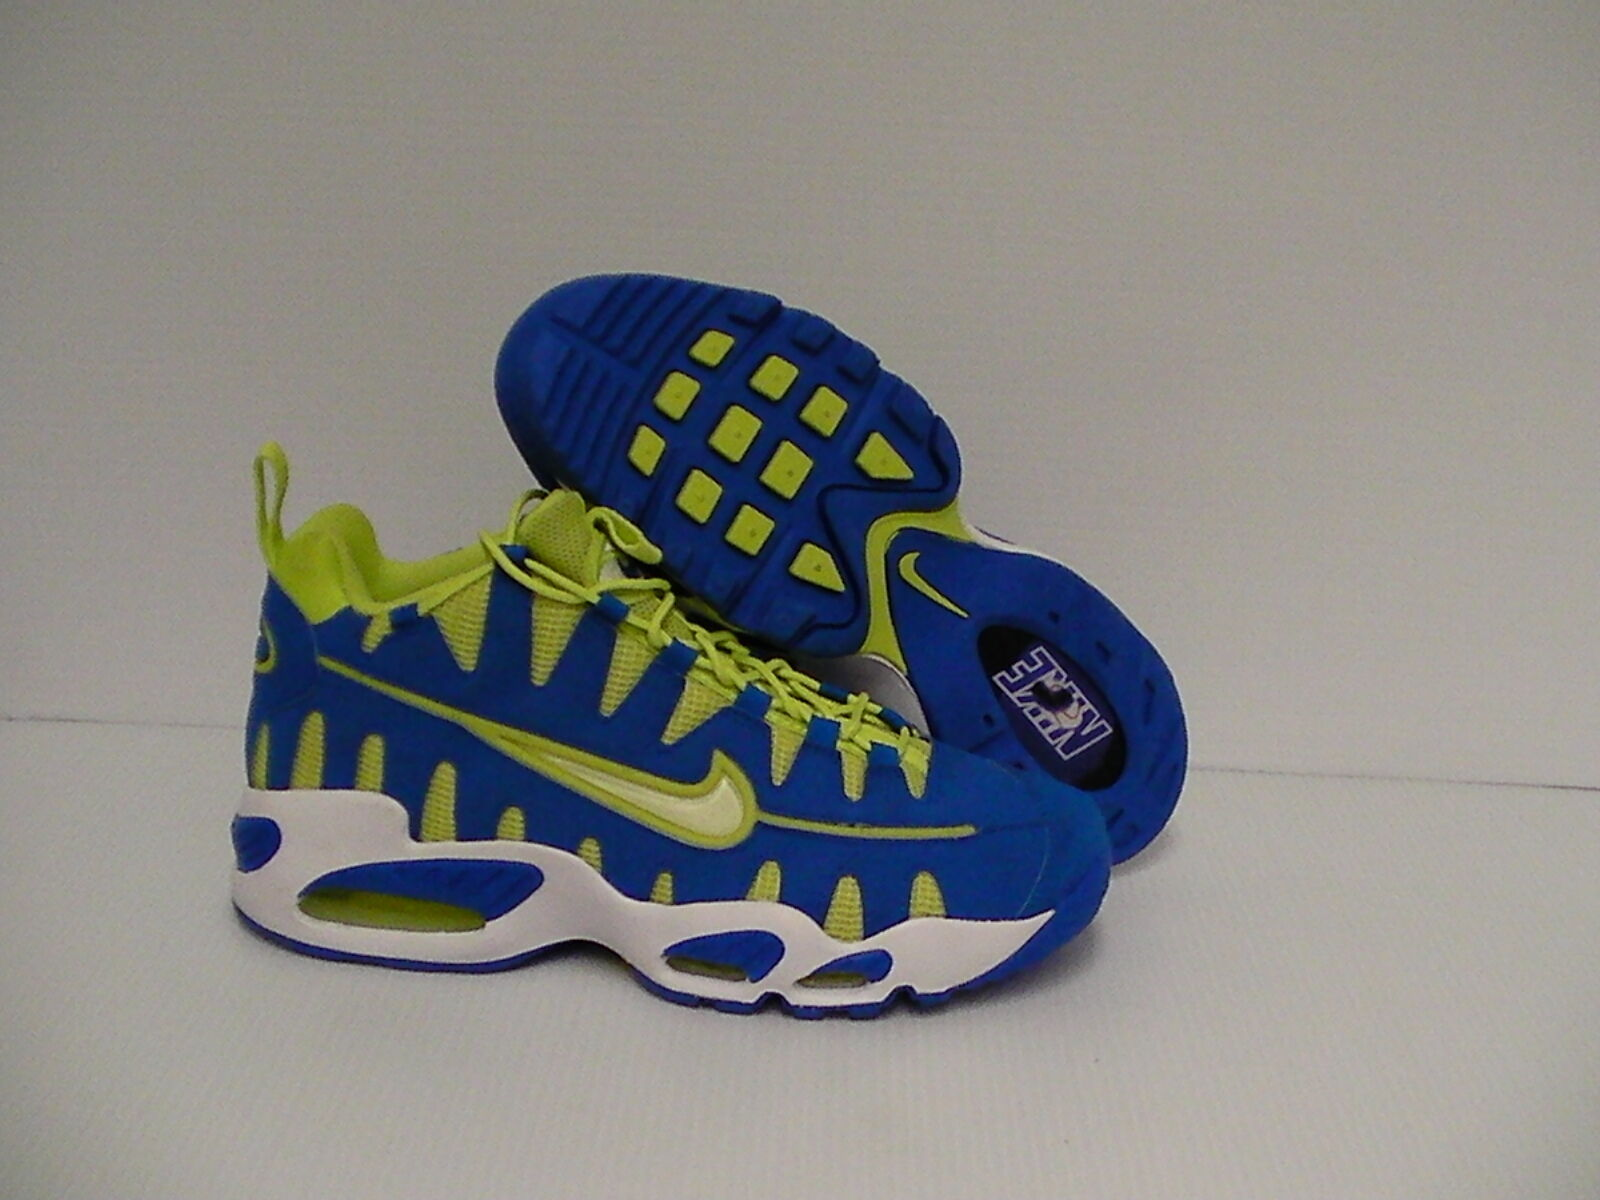 Nike Nike Nike Air Max NM Atletismo Zapatillas Hombre Eu 070666